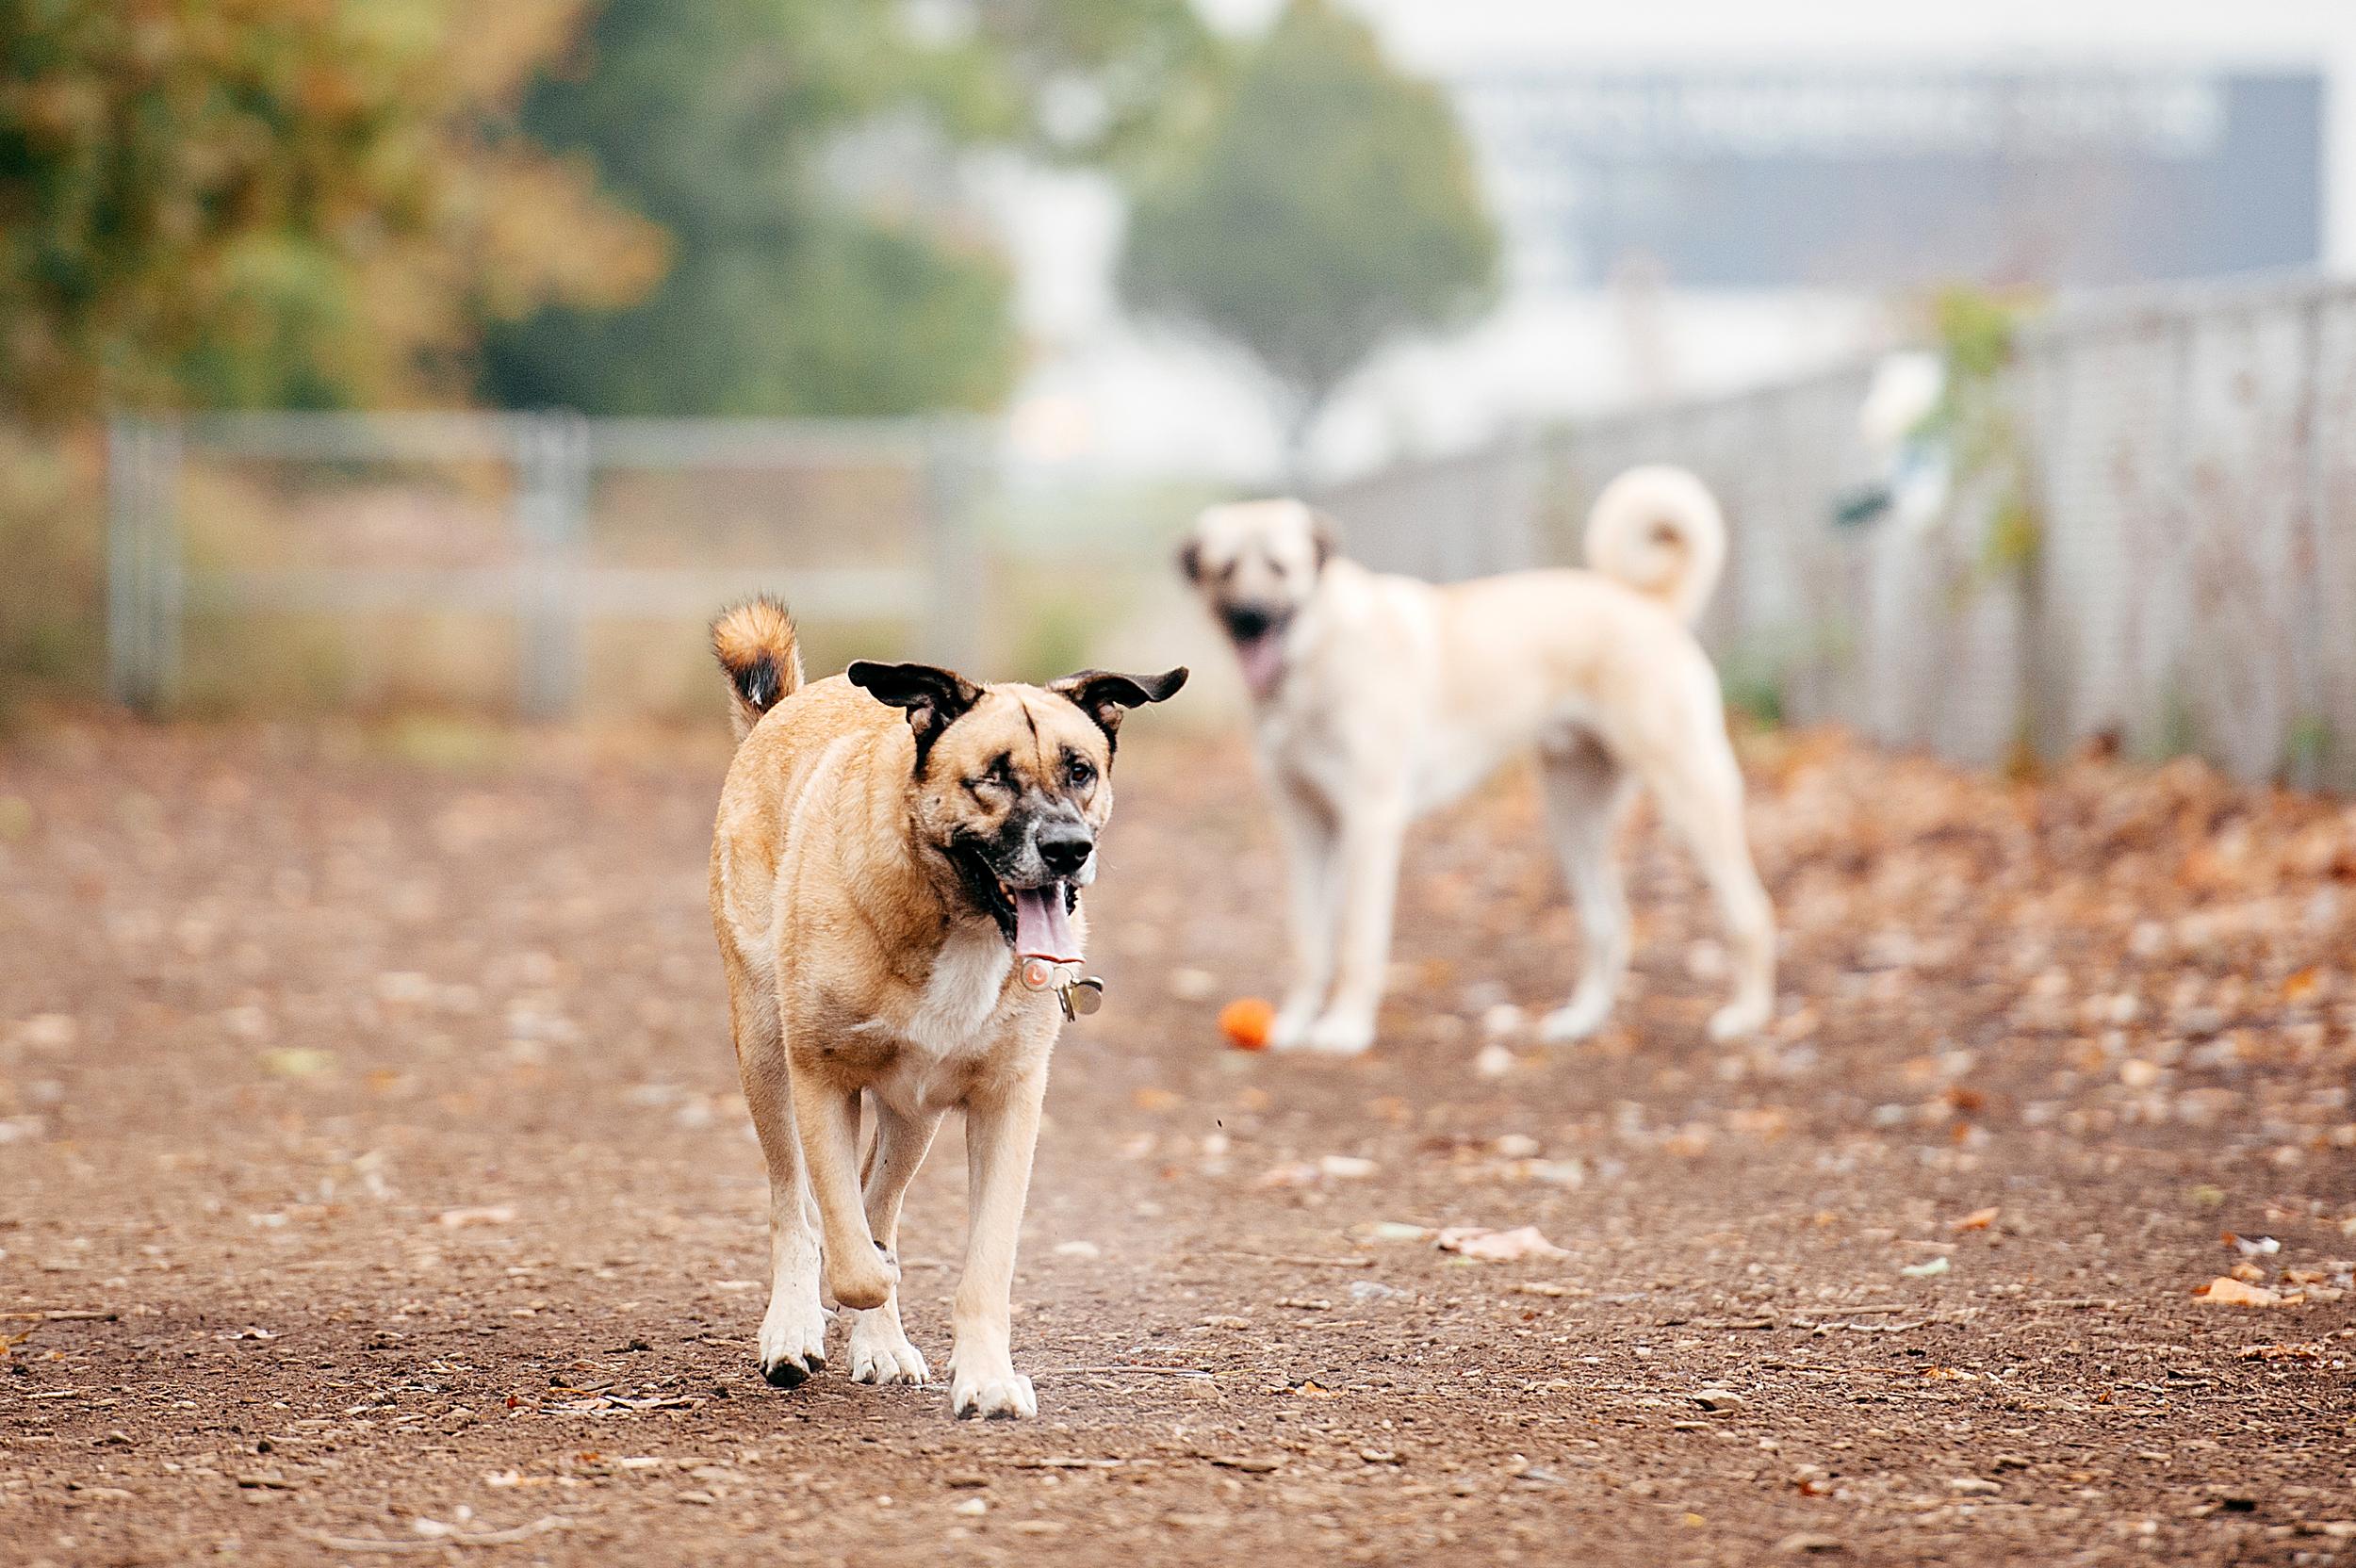 bernard-dog-run-pittsburgh-walsh01.jpg